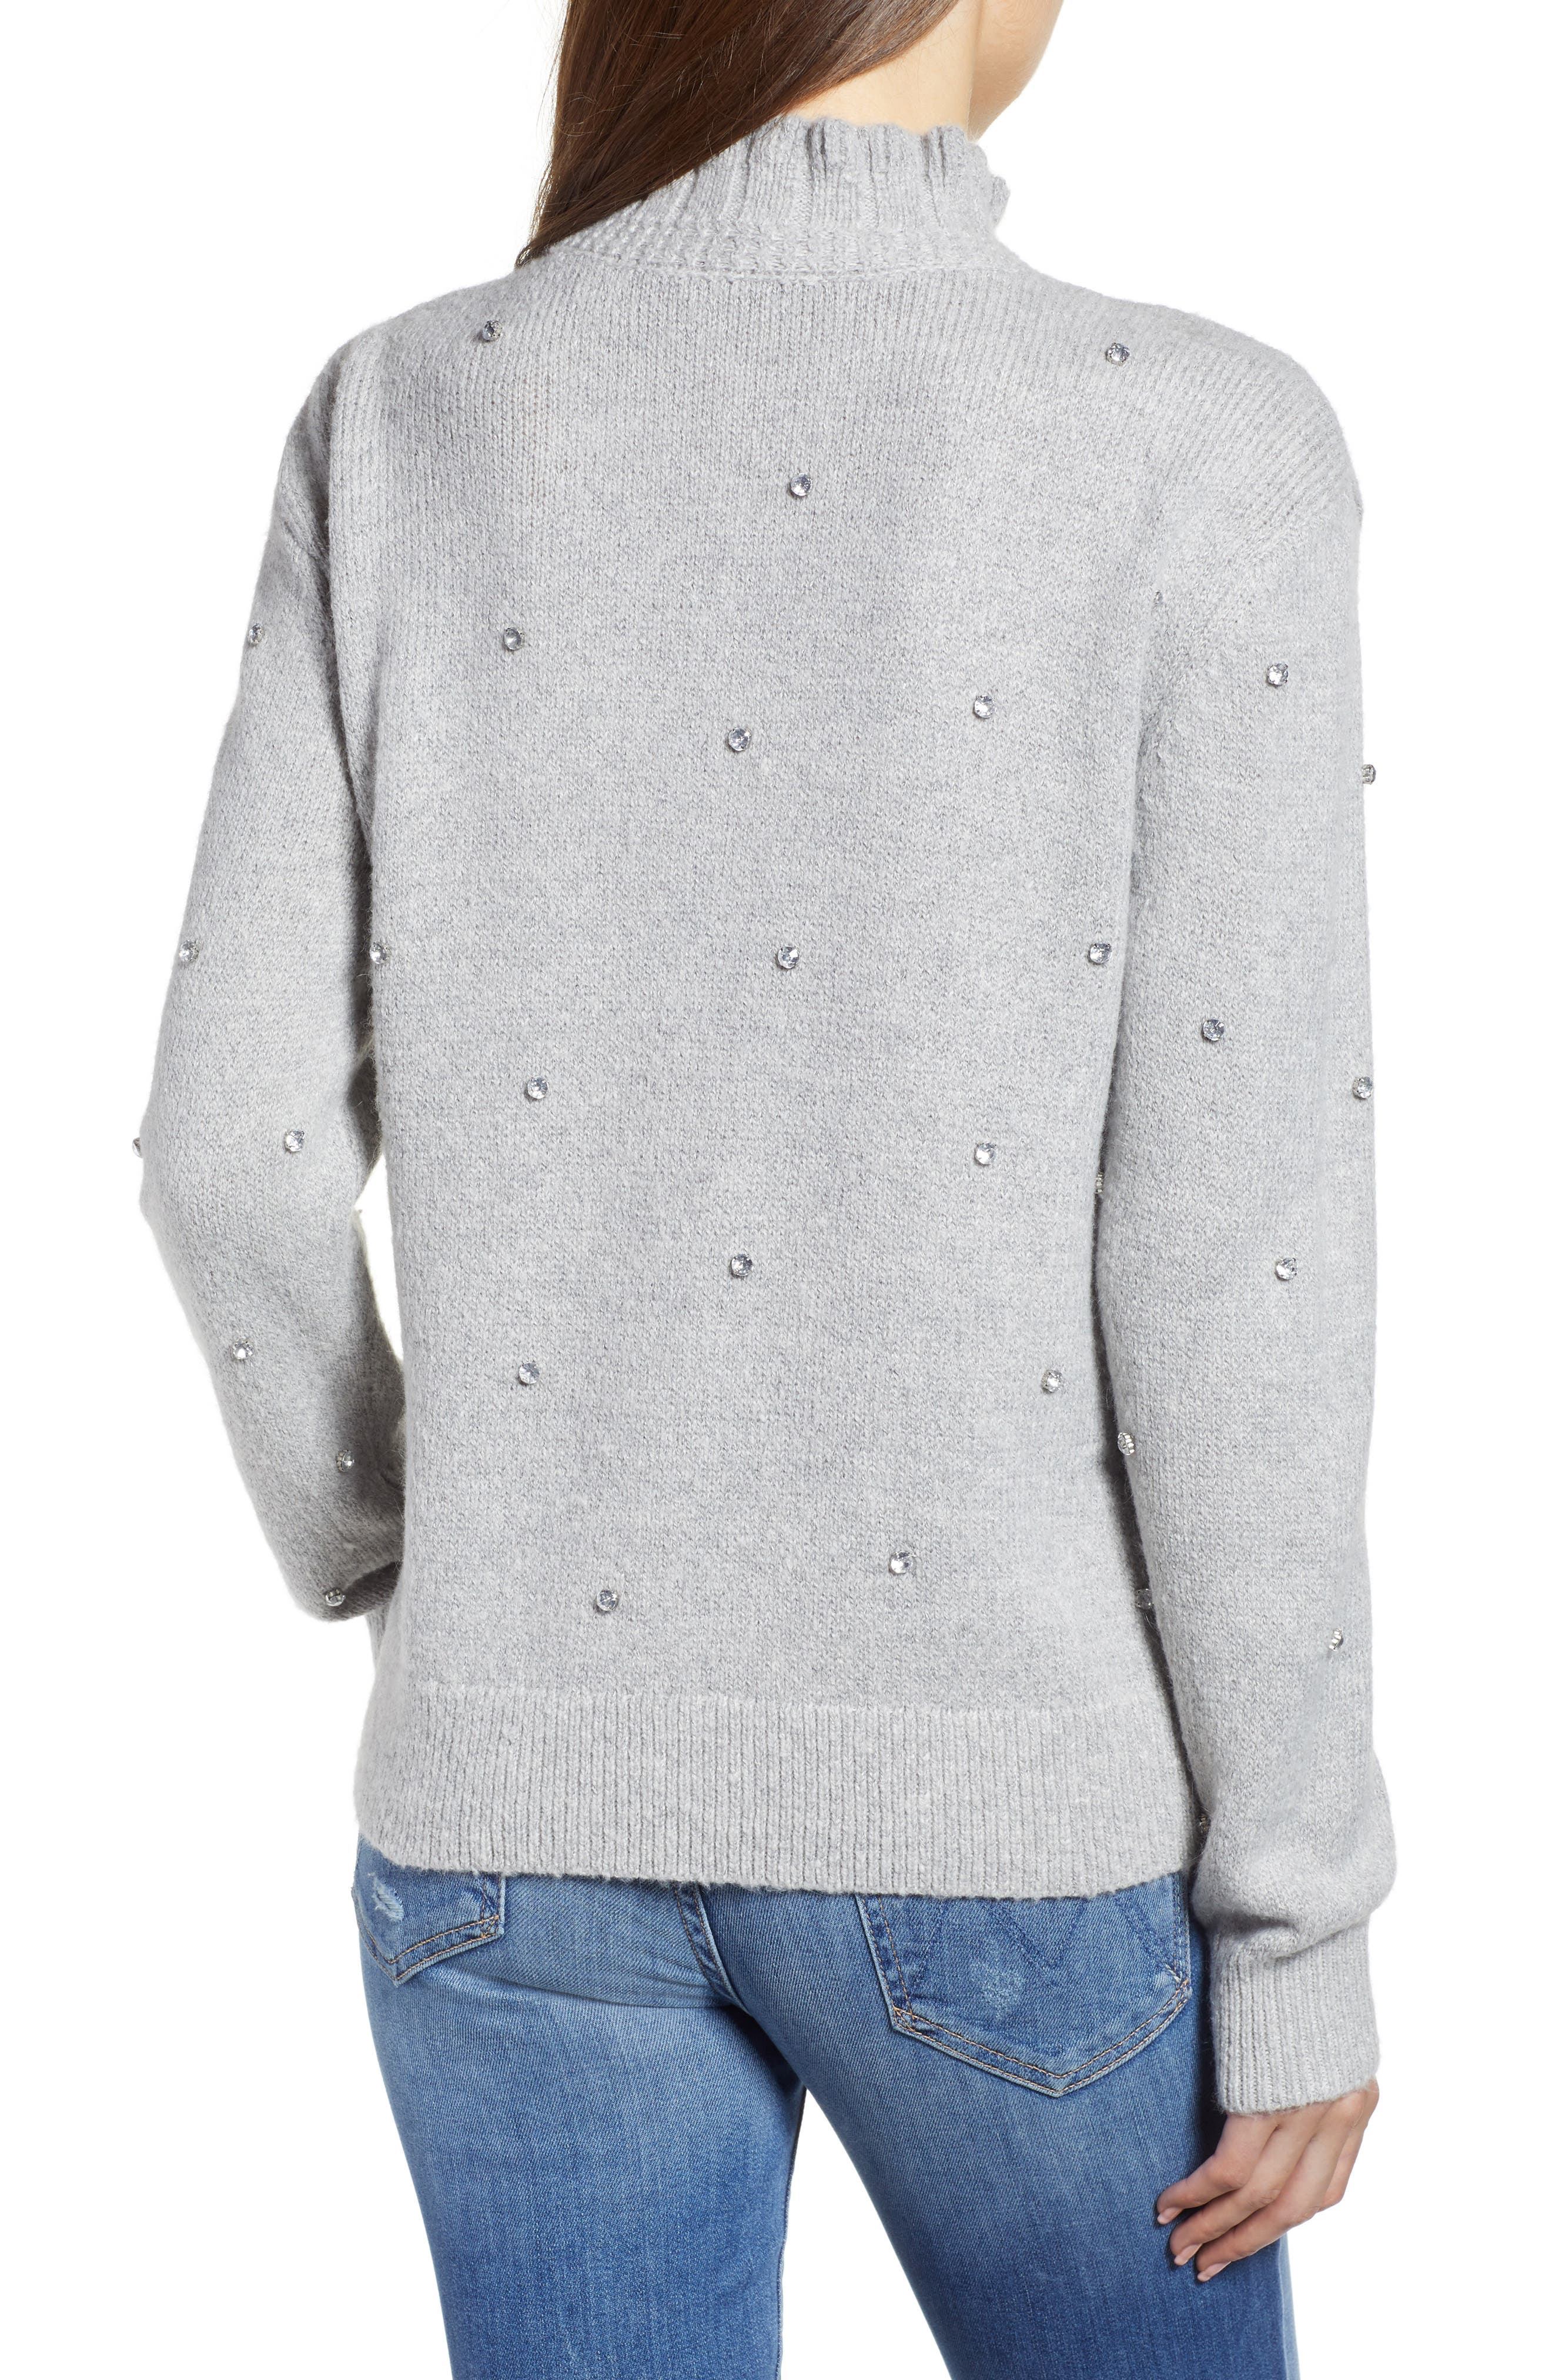 Embellished Ruffle Neck Sweater,                             Alternate thumbnail 2, color,                             GREY LIGHT HEATHER